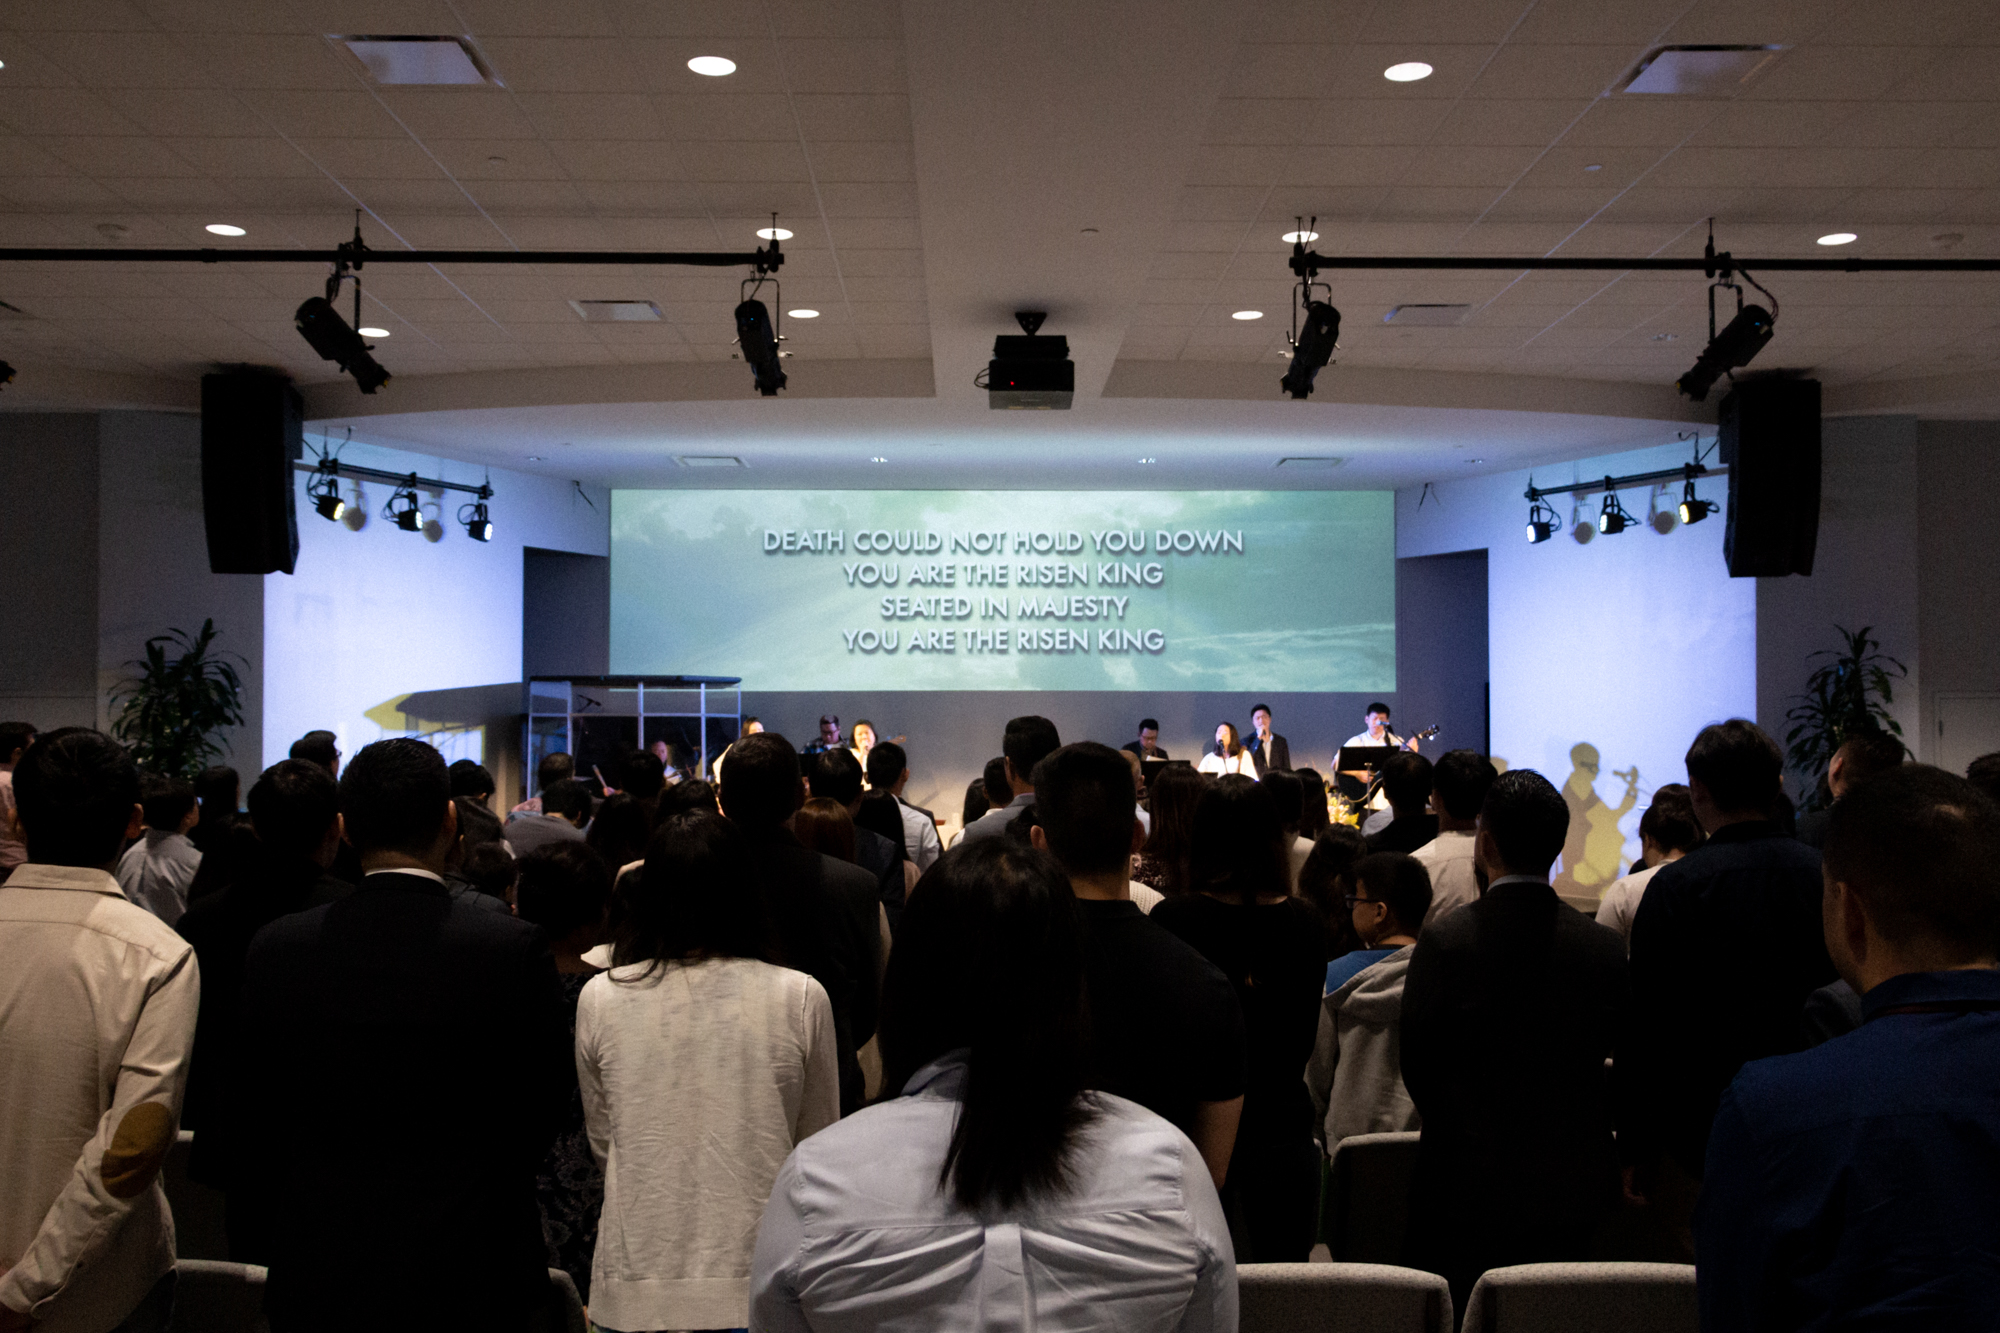 Sunday Worship - First Service: 9:35 AMSecond Service: 11:35 AMChildren's Ministry runs for 11:35 AM worshipAddress:119 Rockland AveNorthvale, NJ 07648